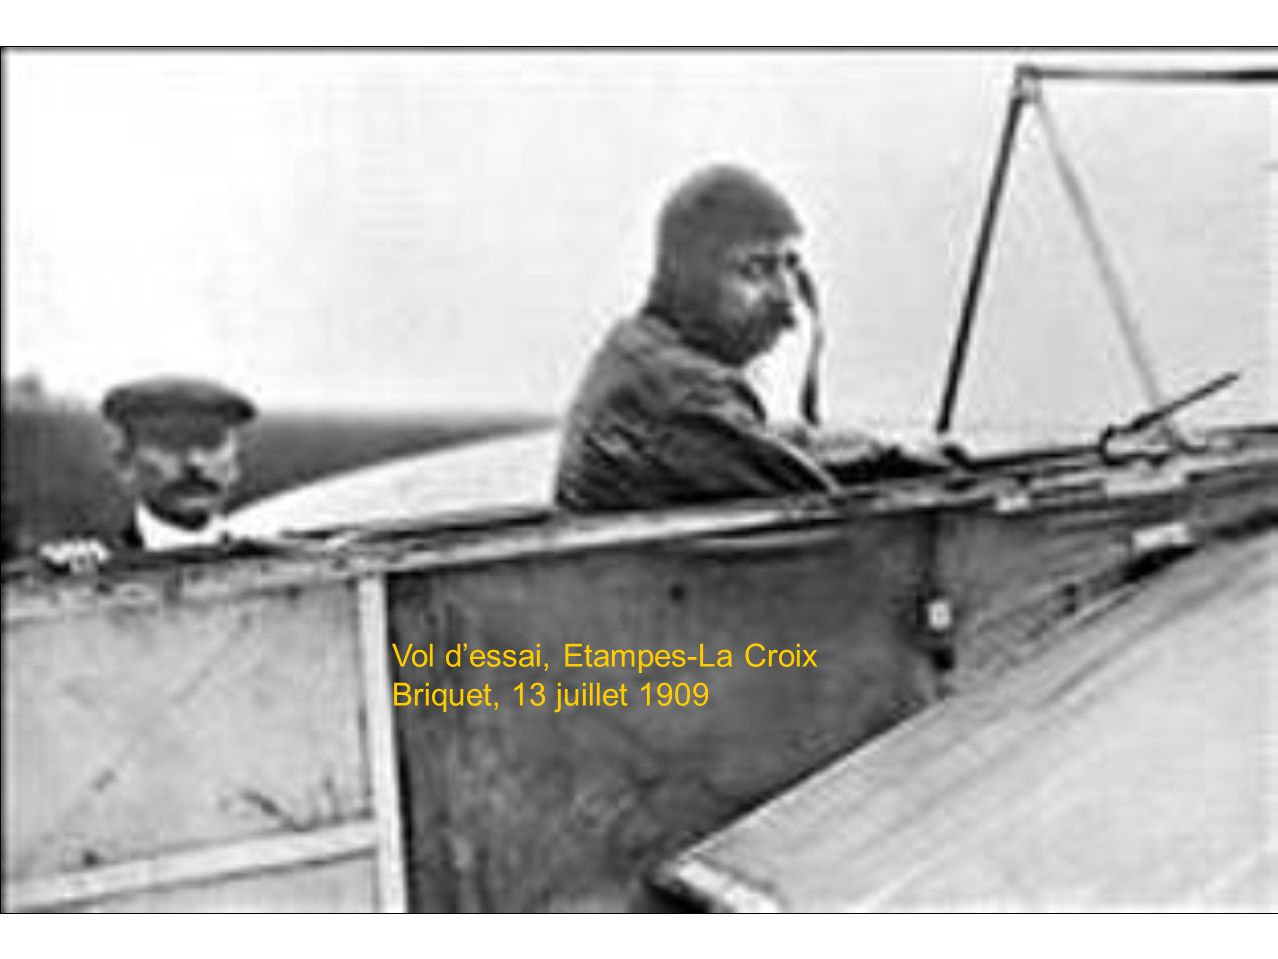 Vol d'essai, Etampes-La Croix Briquet, 13 juillet 1909